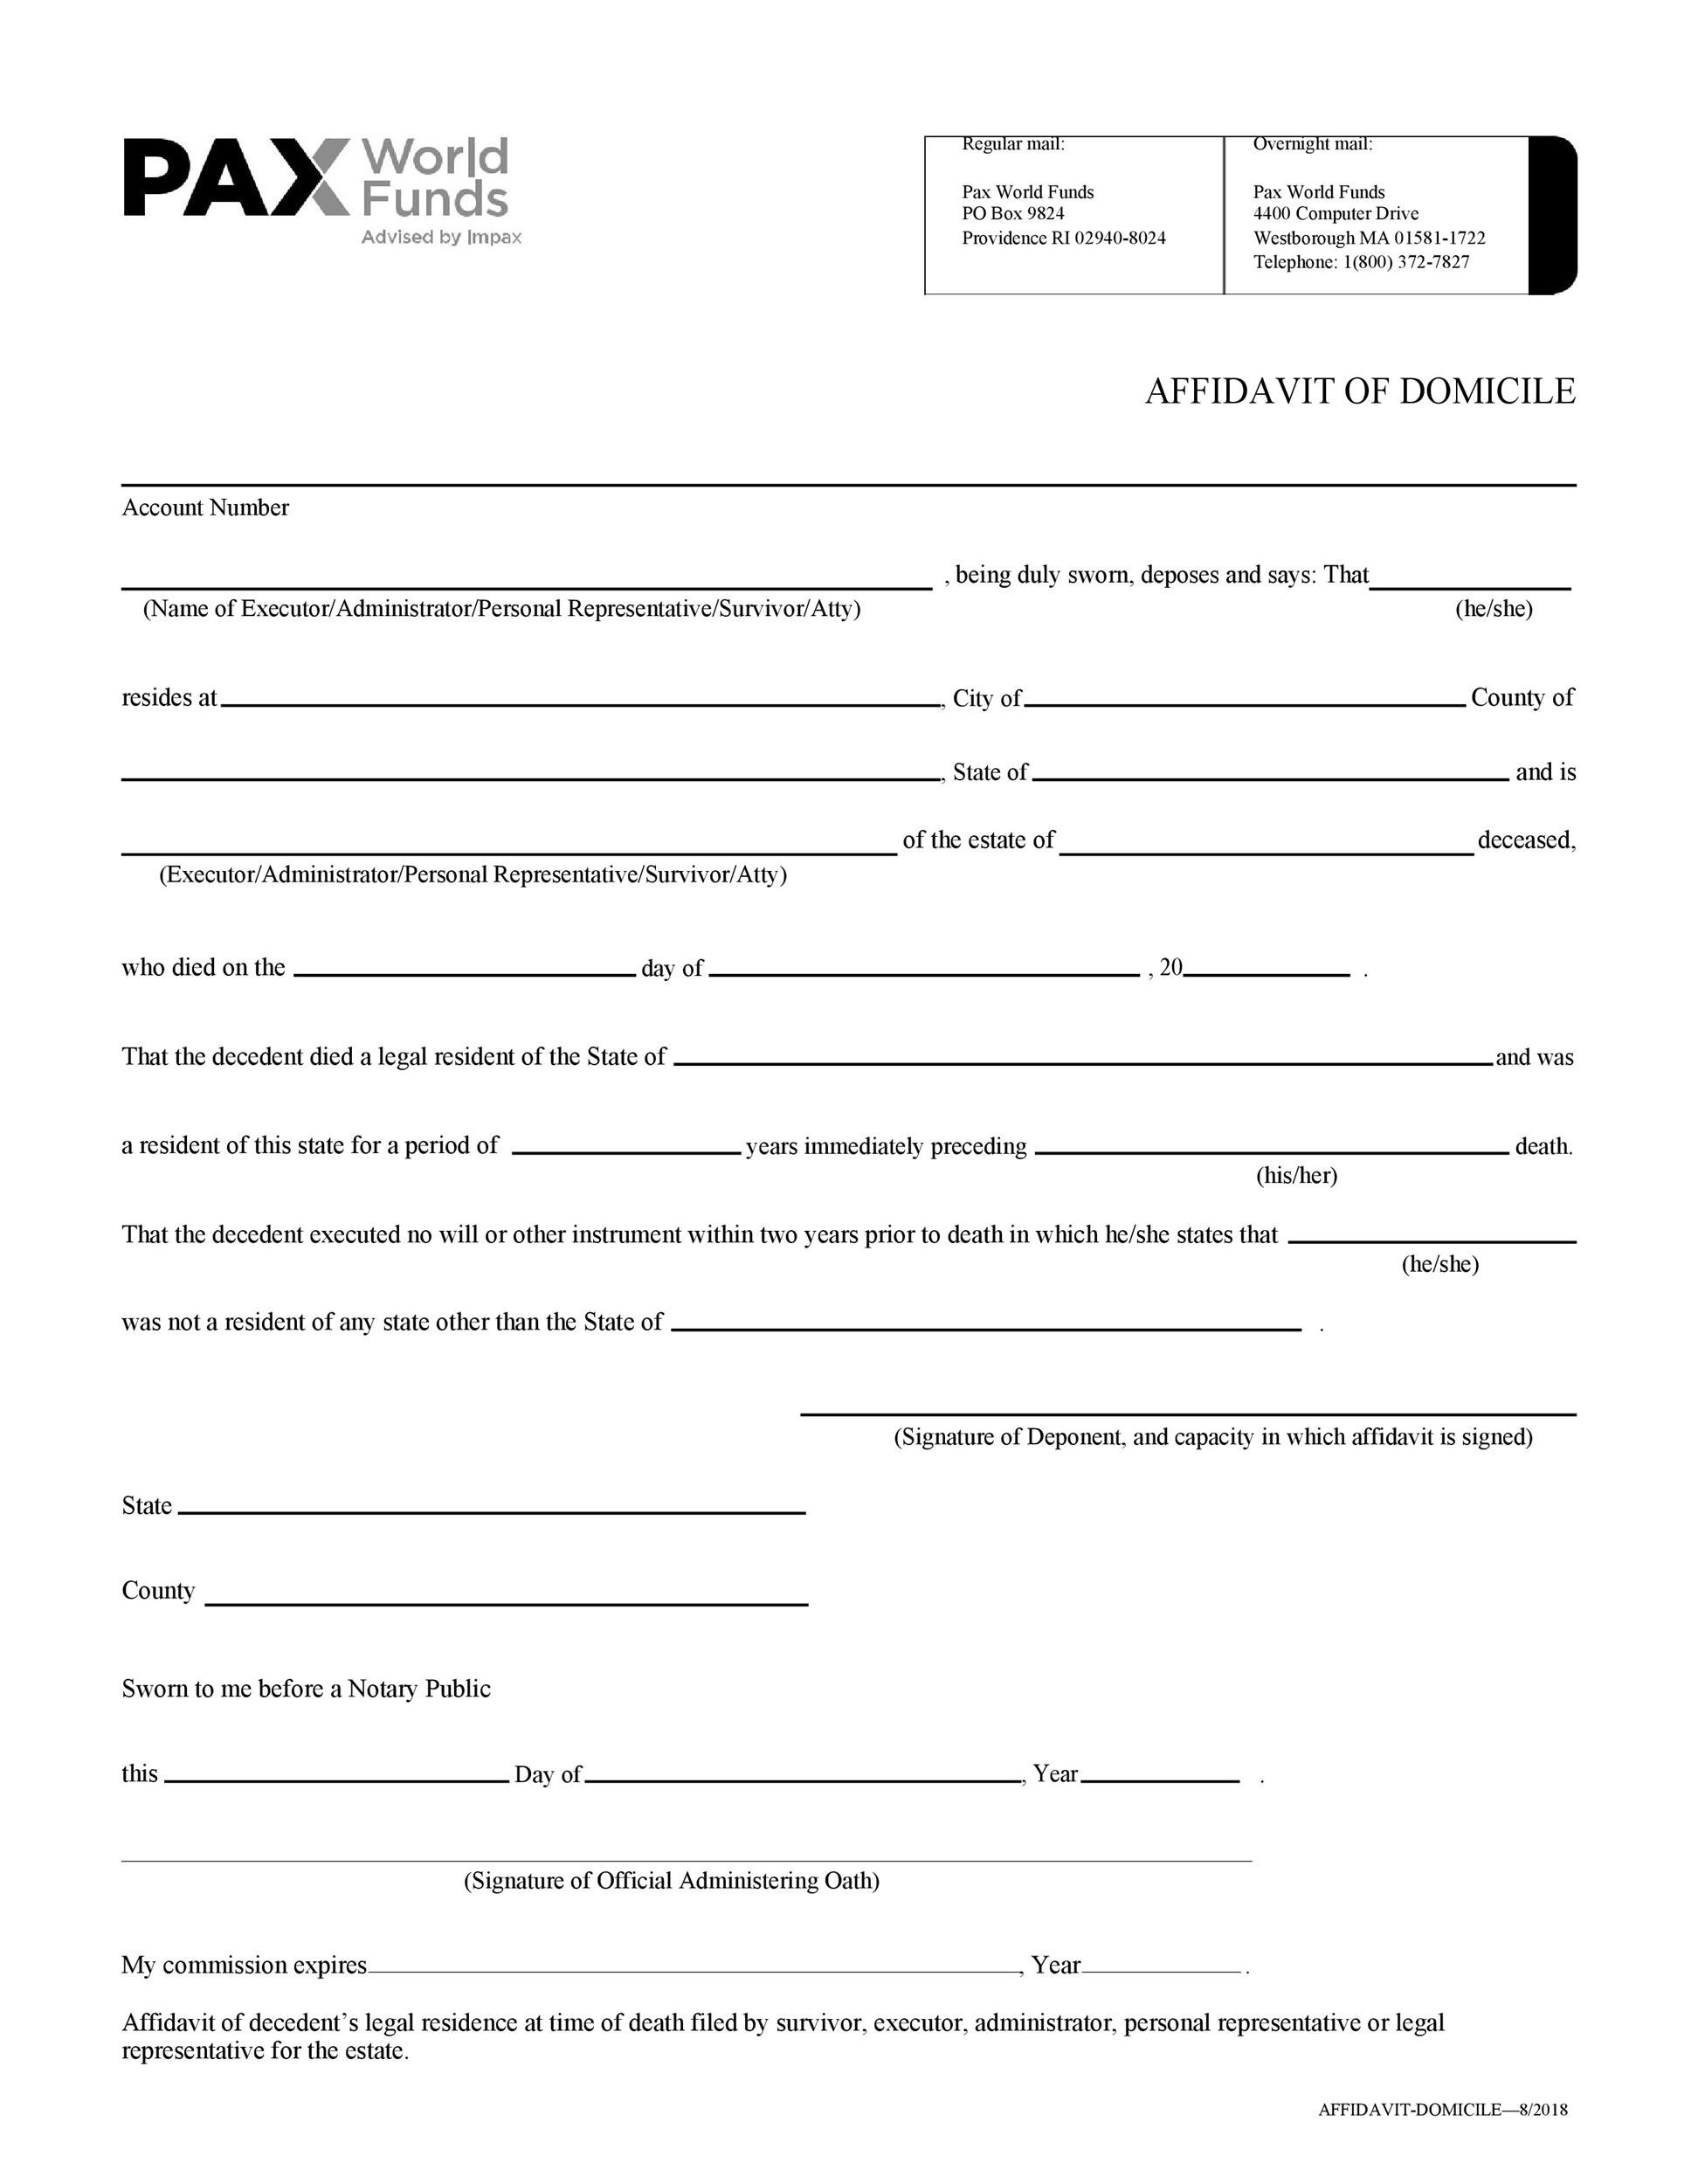 Free affidavit of domicile 26